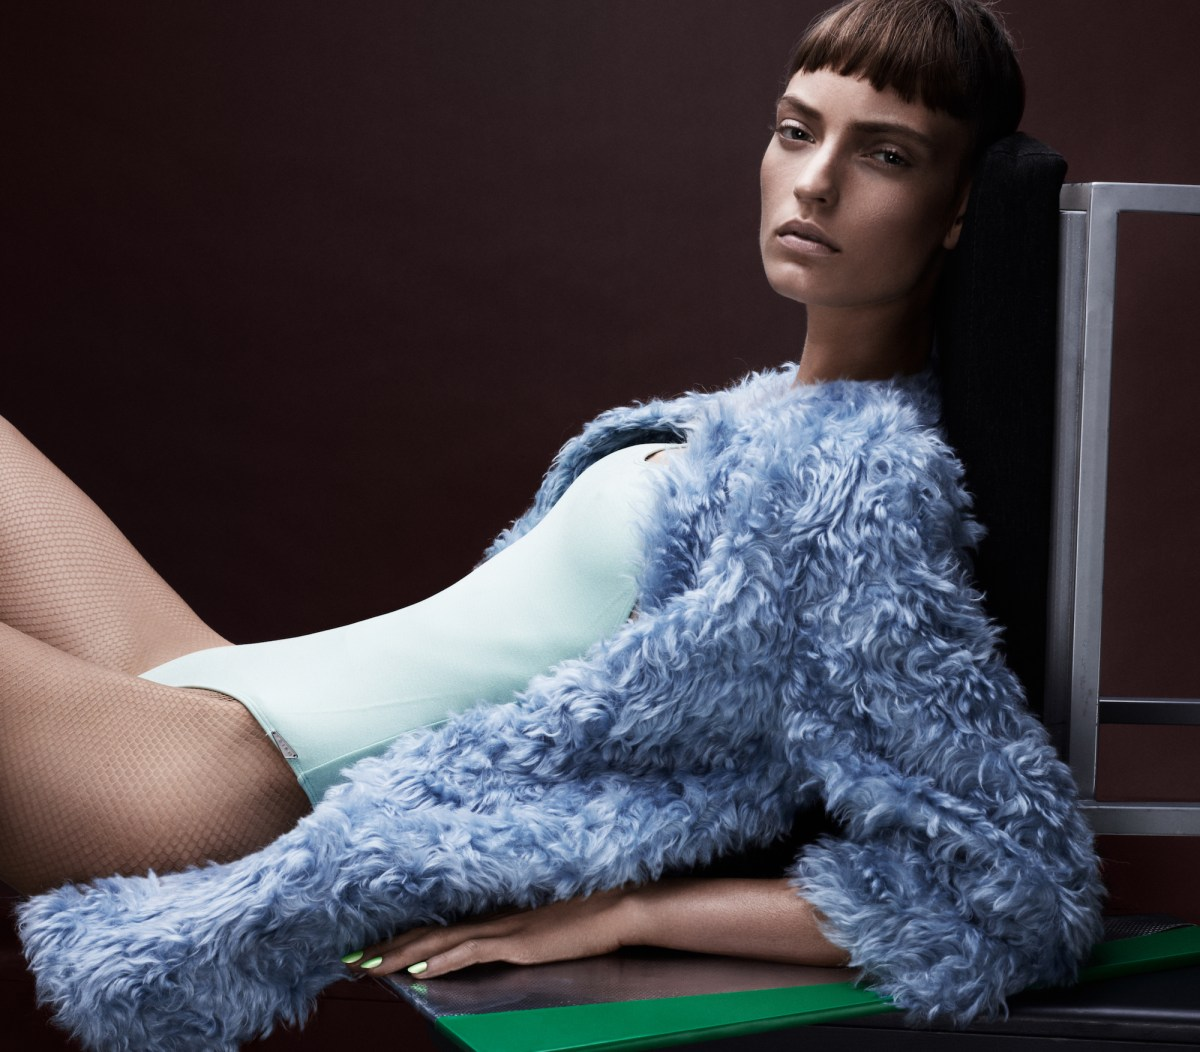 Marikka Juhler by Raf Stahelin for Garage Magazine